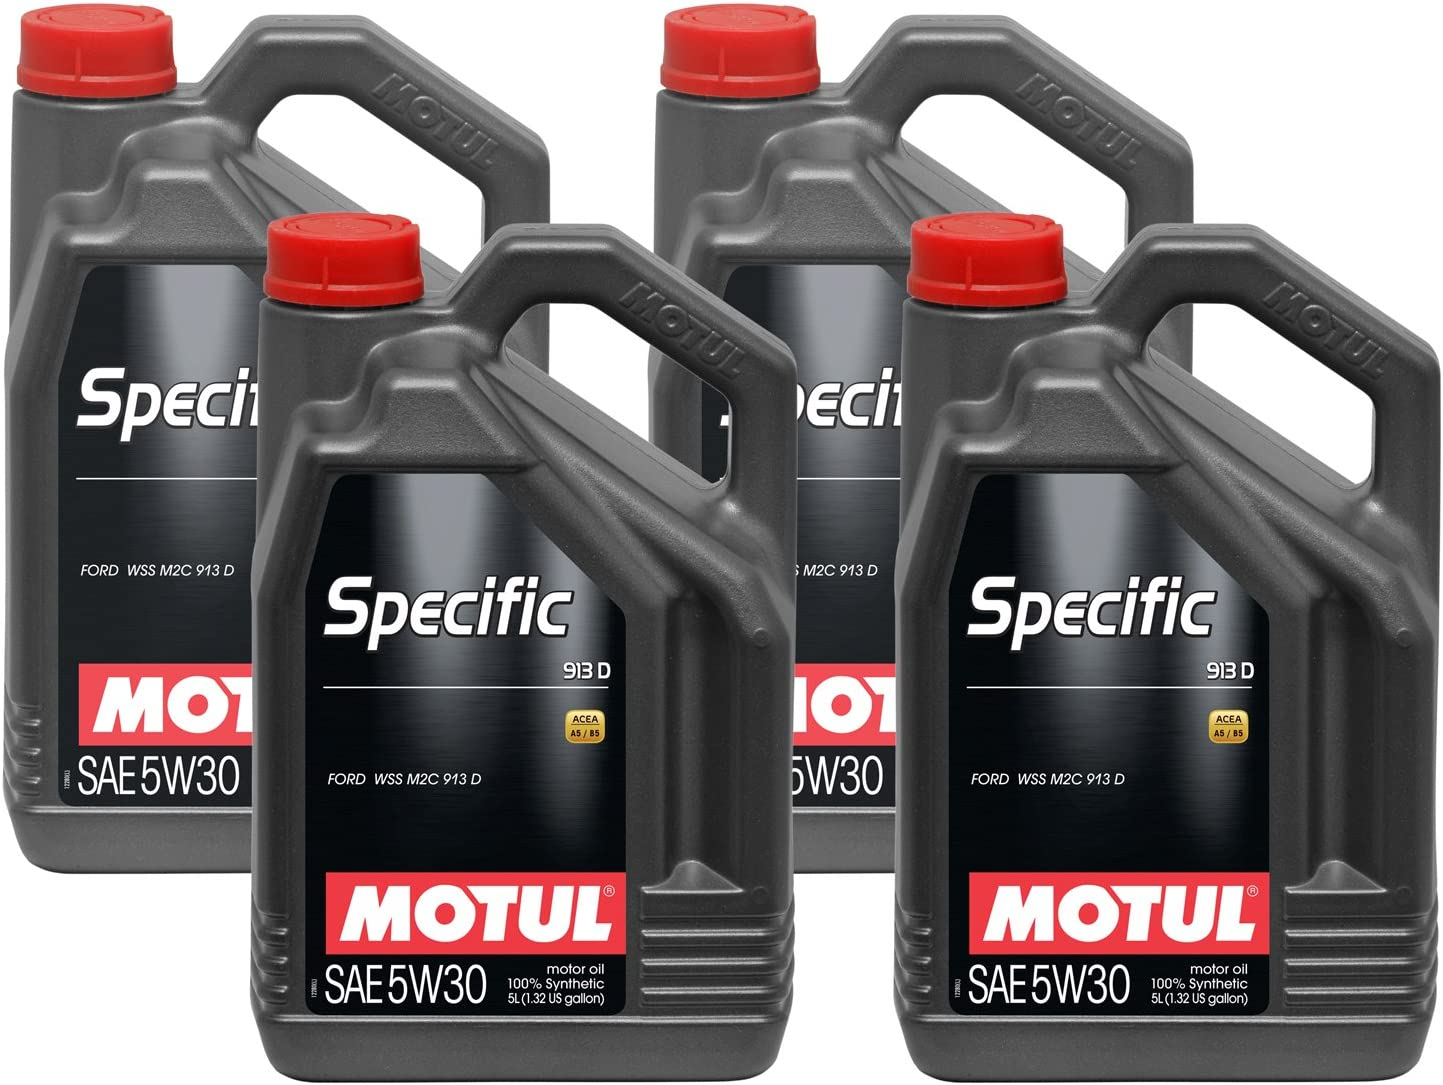 MOTUL Específico Ford 913d aceite de motor 5W30–5litros